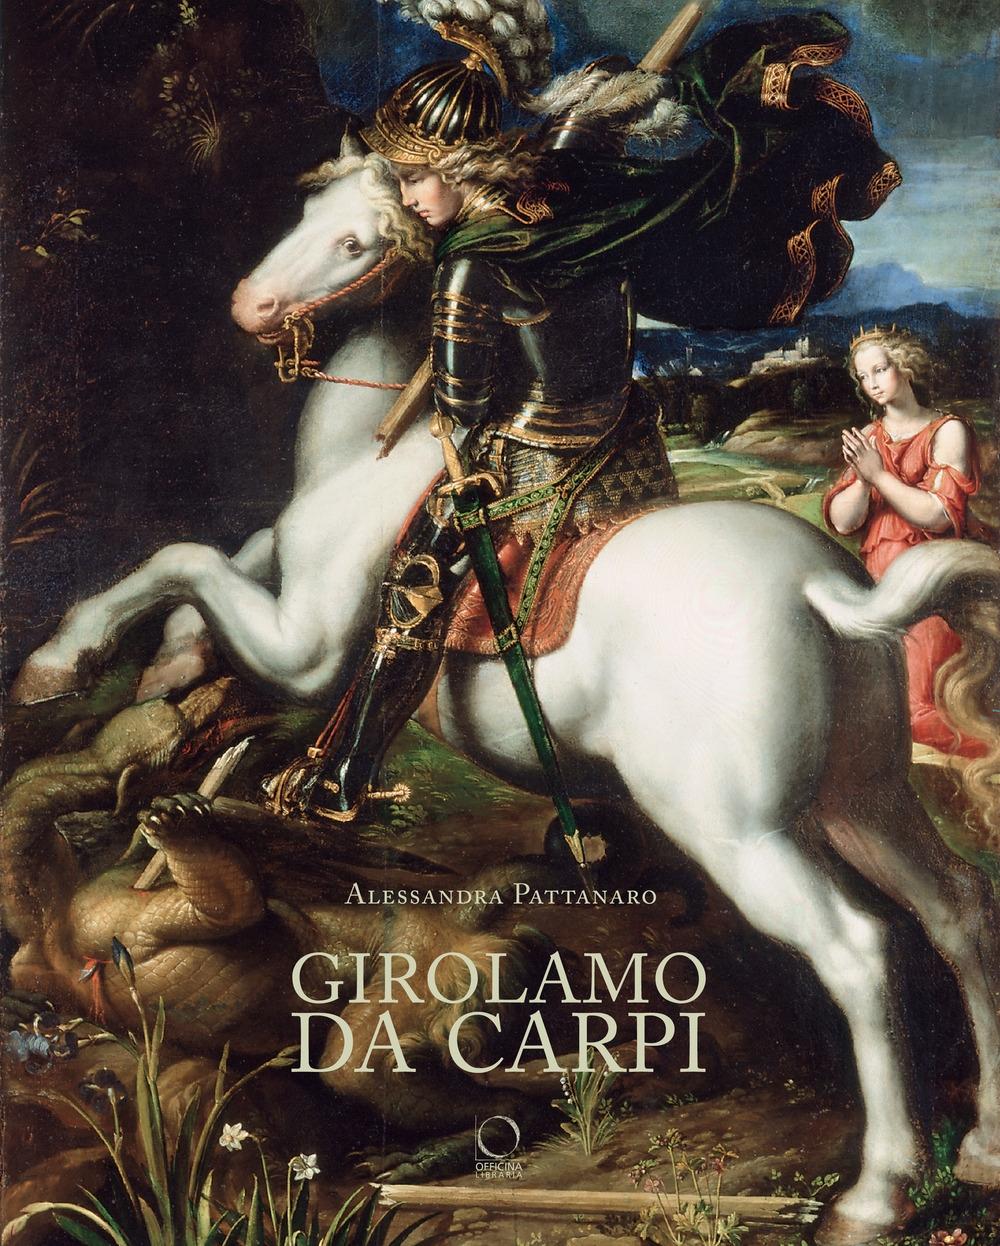 Girolamo da Carpi. Pittore e disegnatore ferrarese 1501-1556